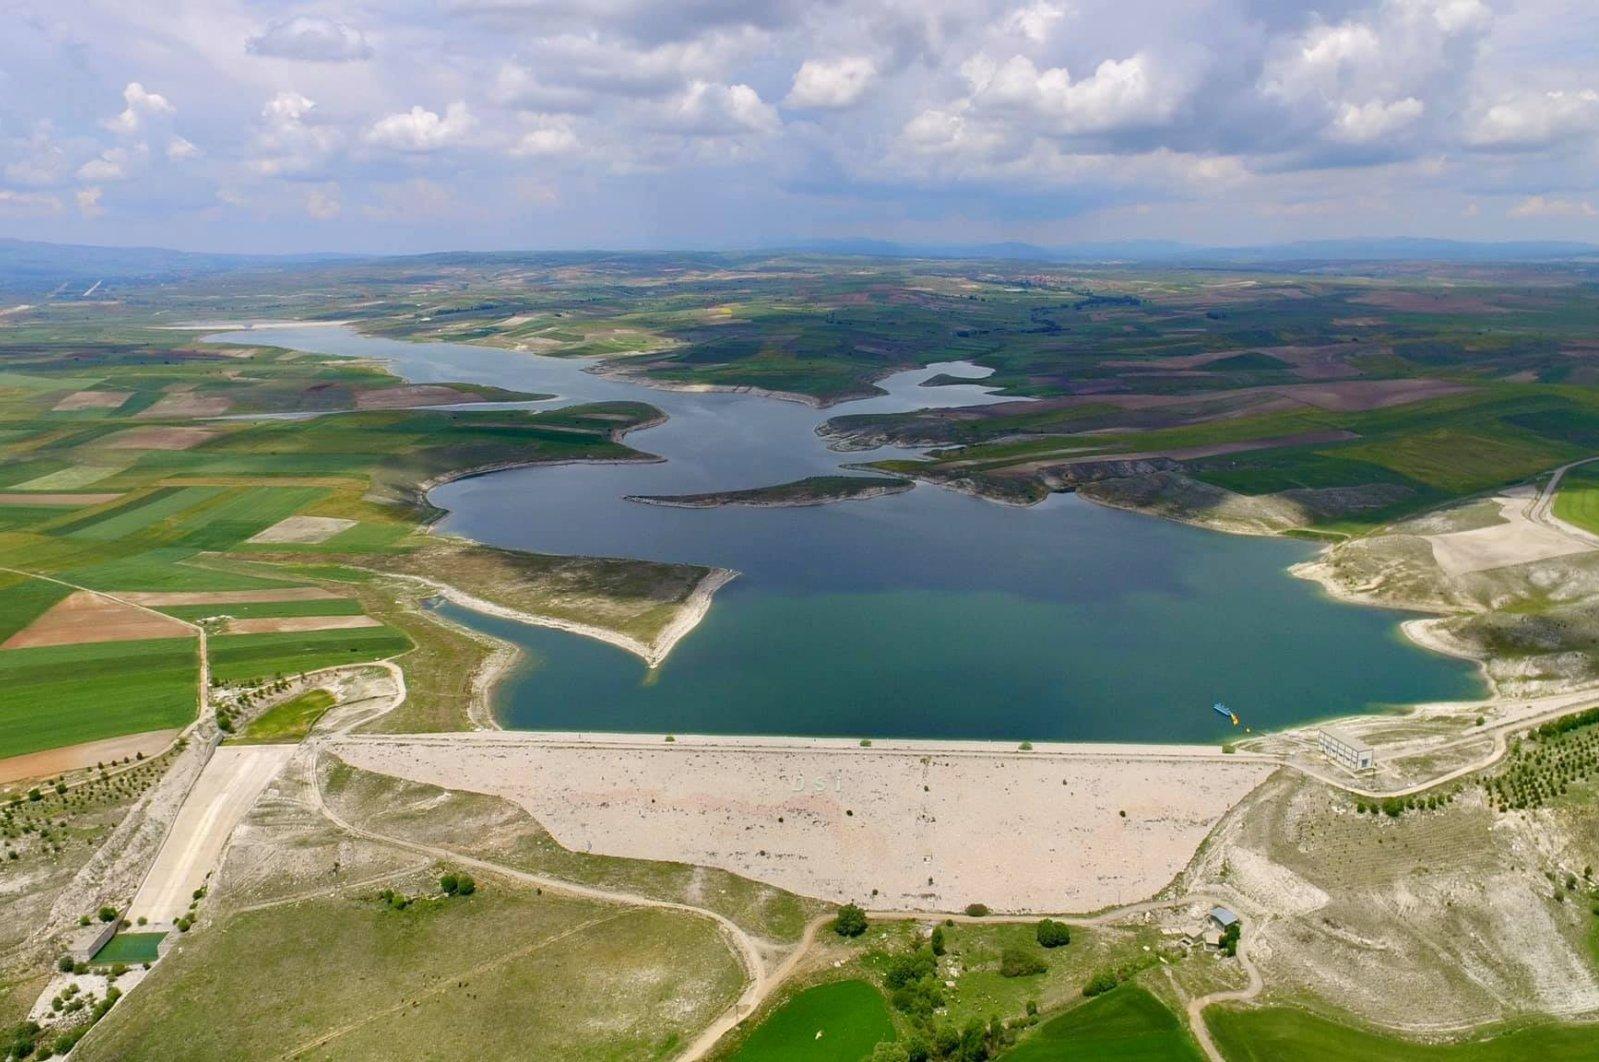 A view of Akdeğirmen dam which has little water, in Afyon, western Turkey, Mar. 22, 2021. (İHA PHOTO)